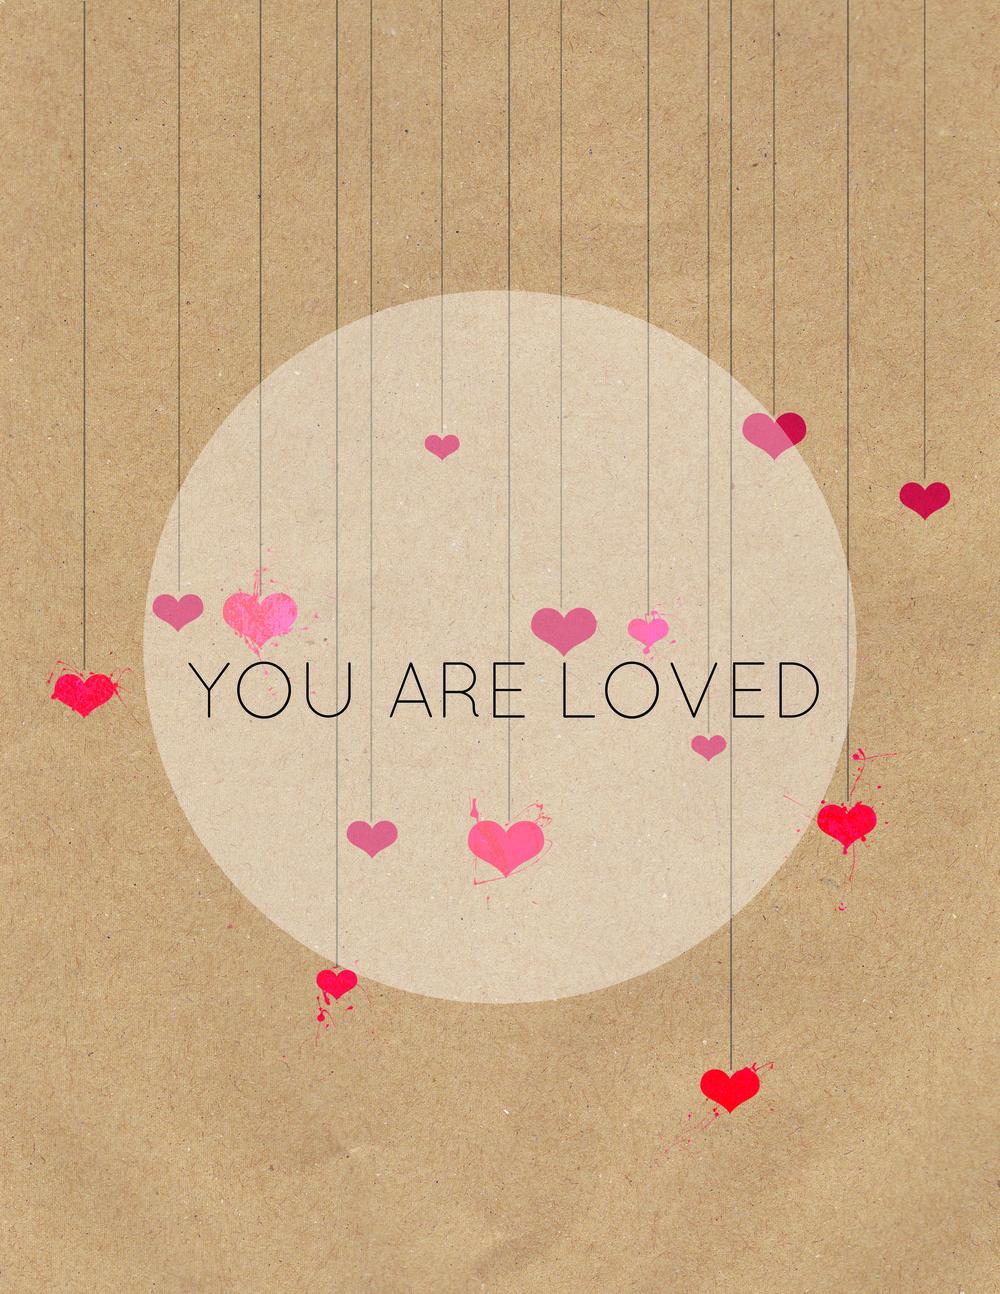 YouAreLoved1.jpg